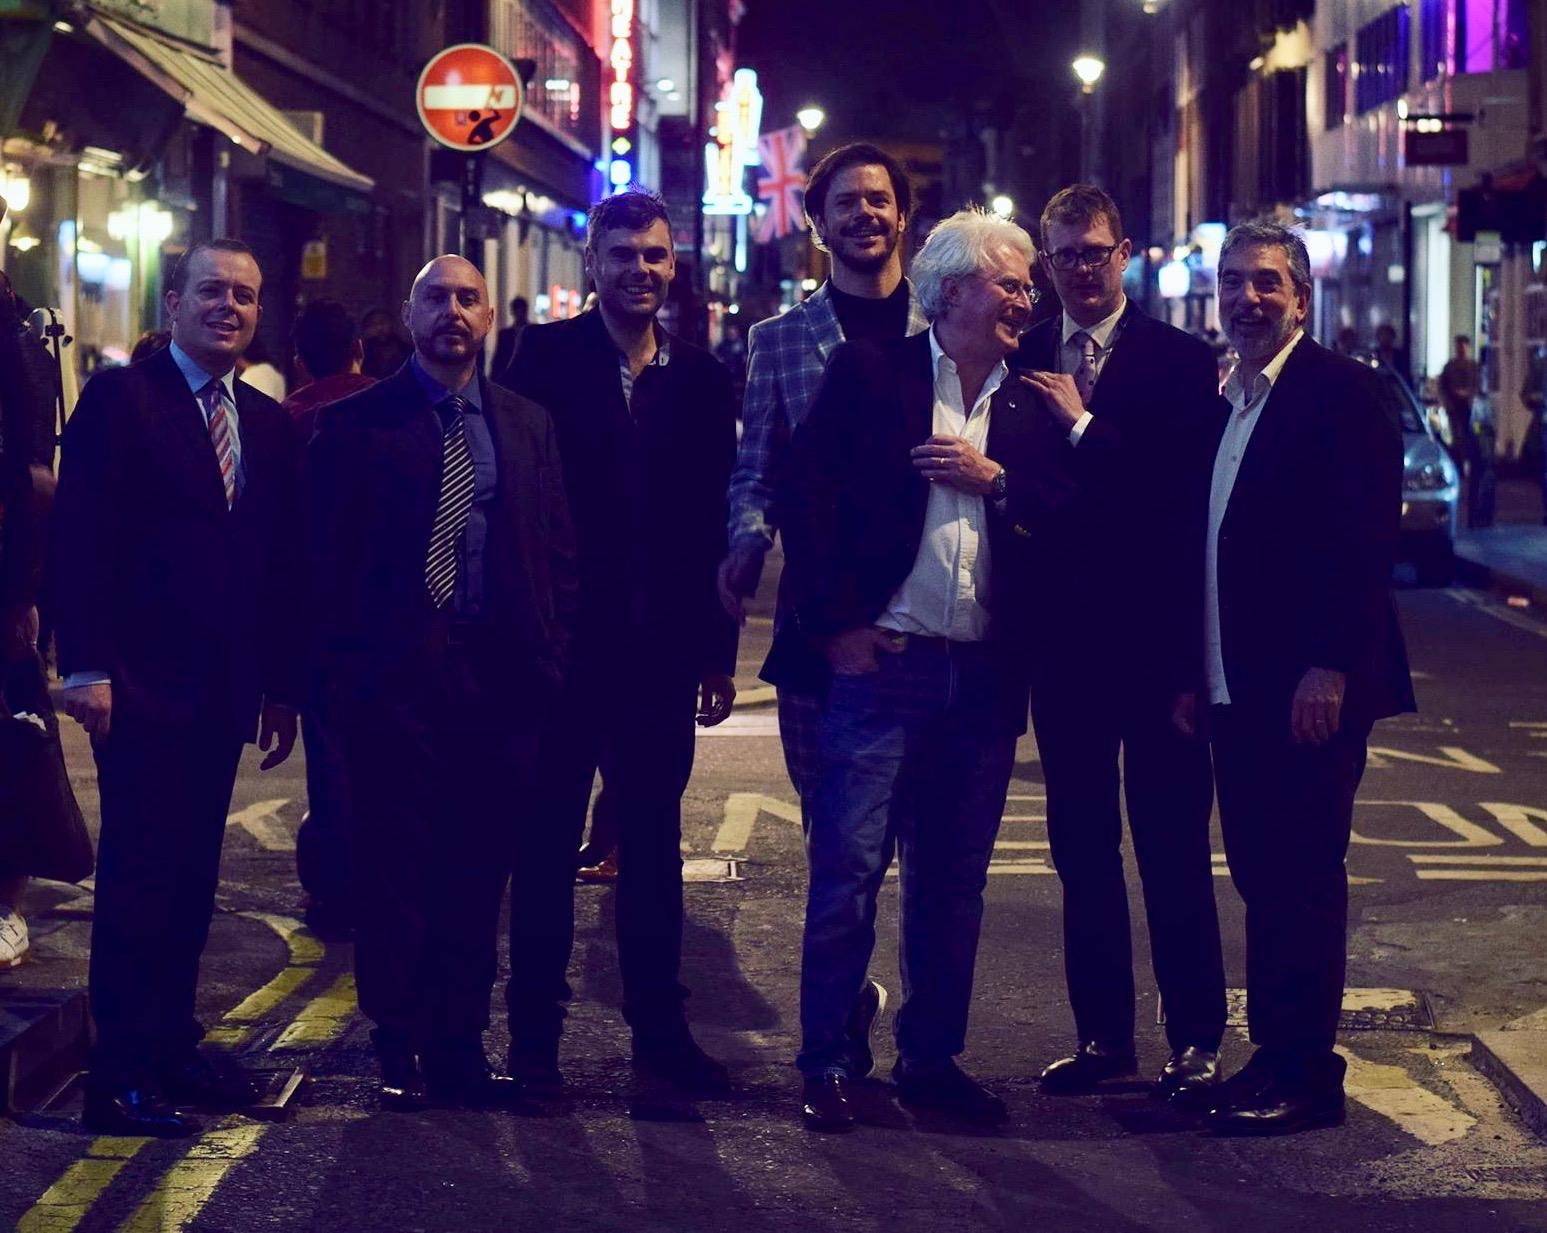 Left to Right: Bernd Reiter, Aldo Zunino, Erik Soderlind, Seamus Blake, Martin Hummel, Eric Alexander, Mike LeDonne.